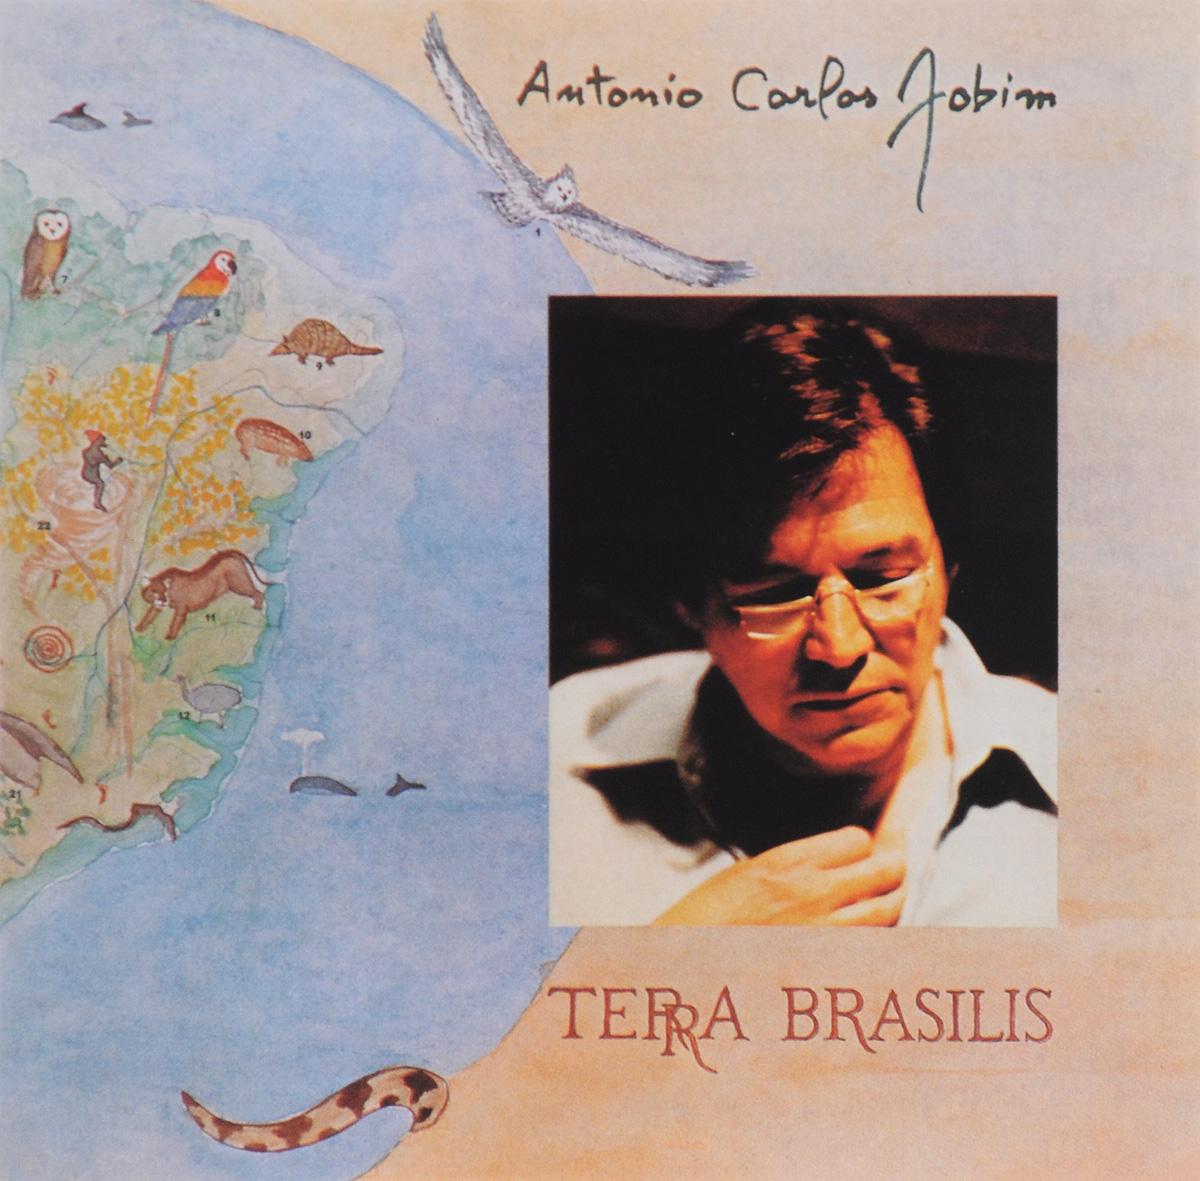 все цены на Антонио Карлос Жобим Antonio Carlos Jobim. Terra Brasilis